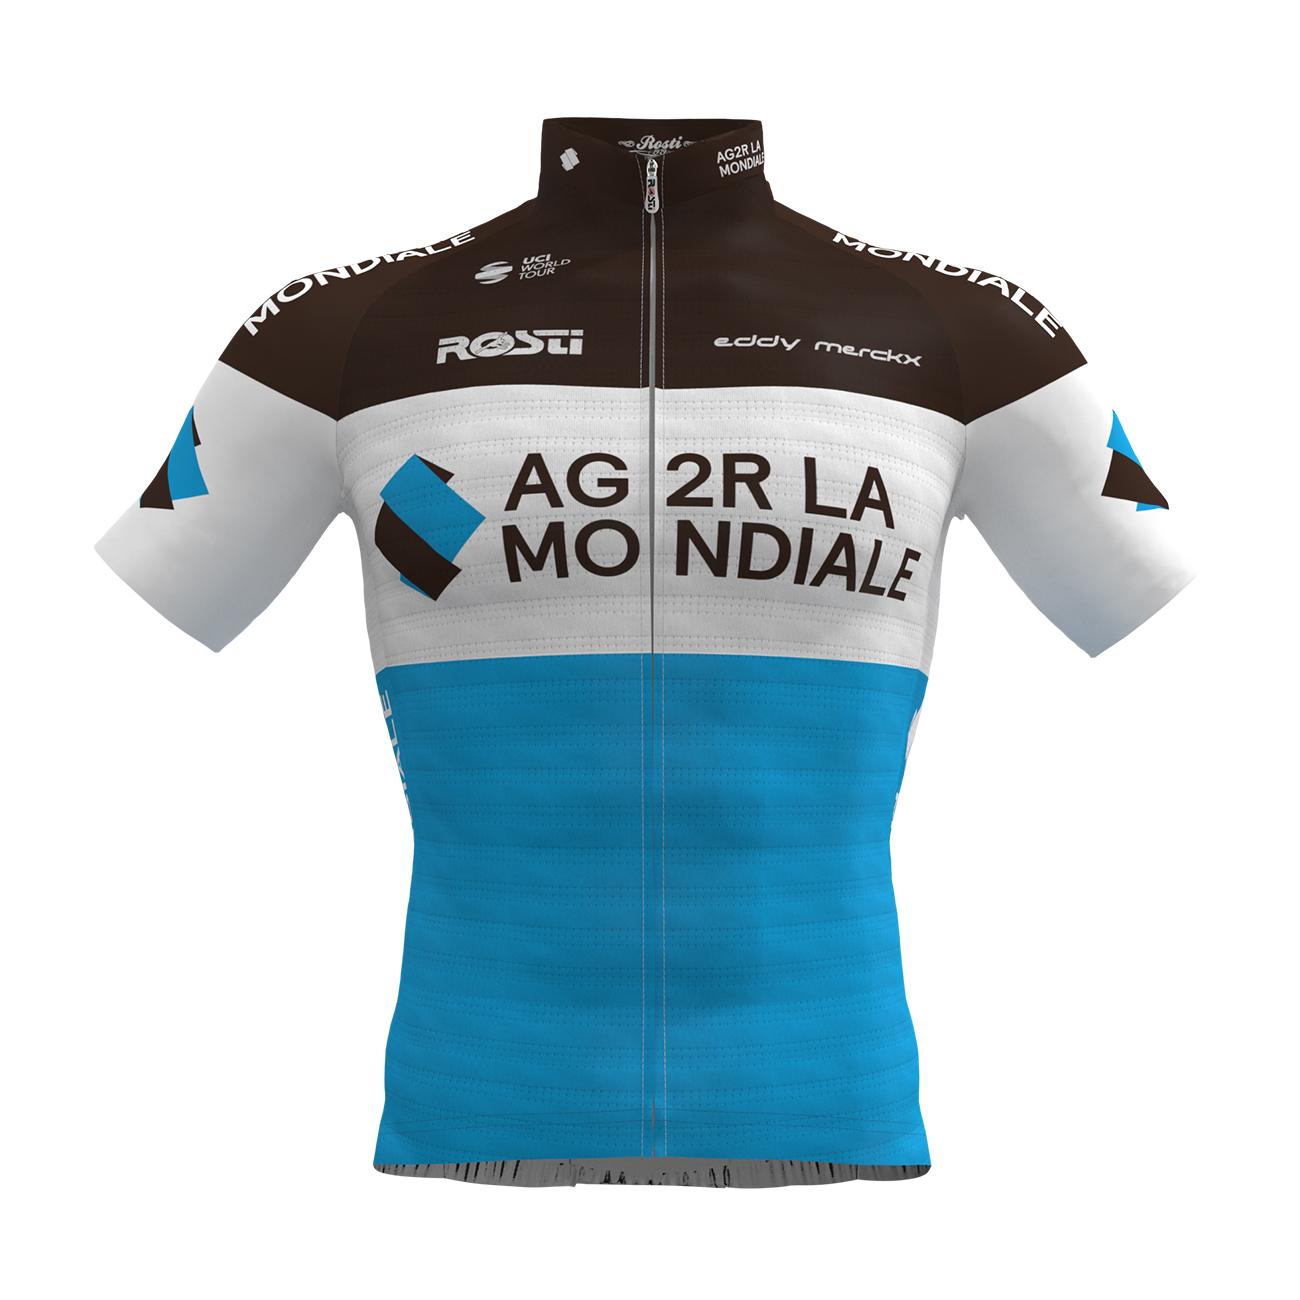 a3d4adb927404 ROSTI AG2R 2019 dres - brown/white/blue • holokolo.sk